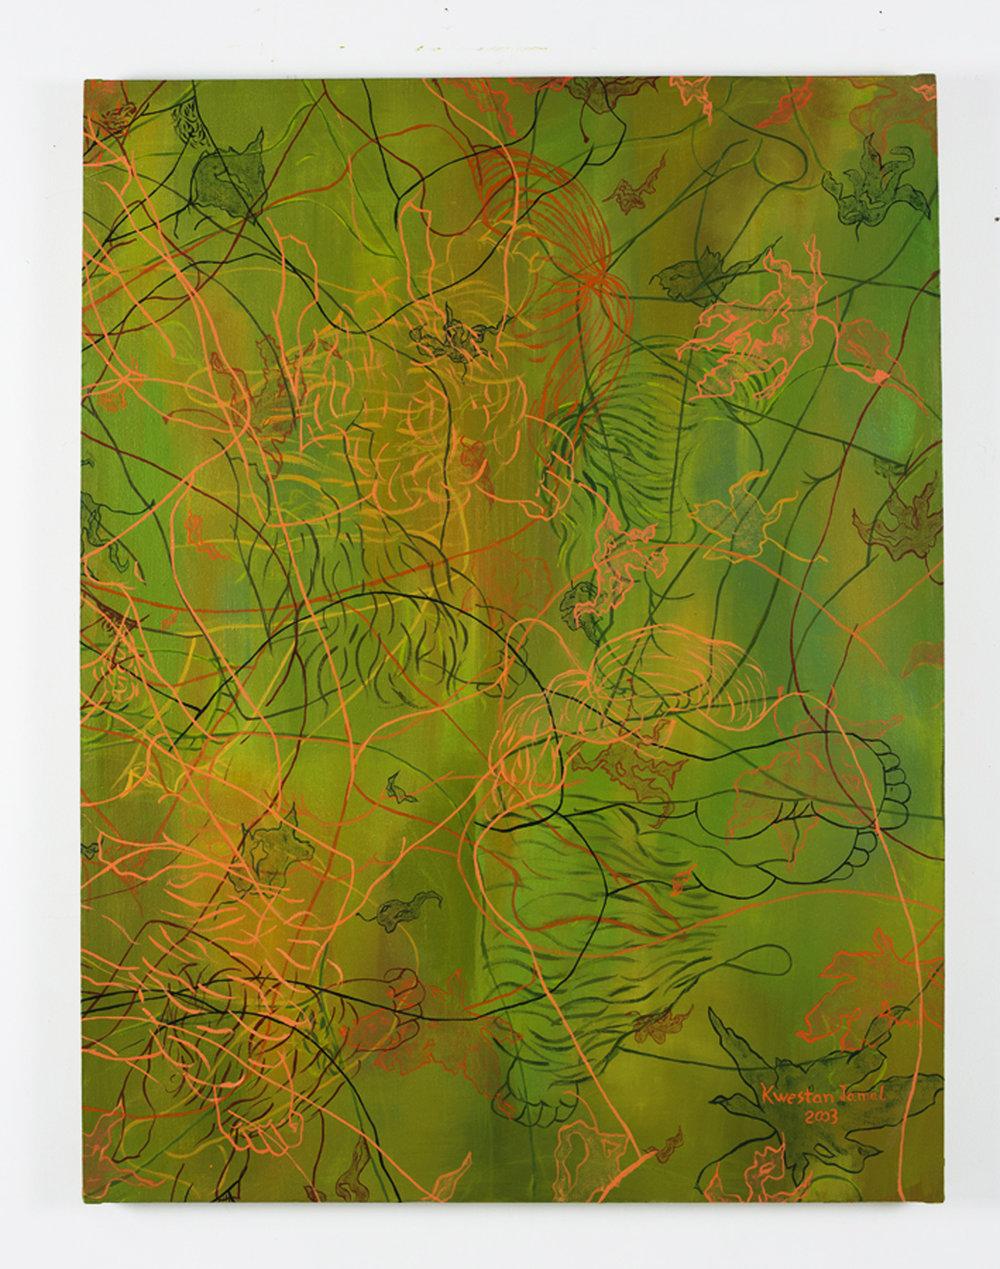 Part 2. Oil pn Canvas W108xH143,2003 Tittel Paiza Miwan.jpg